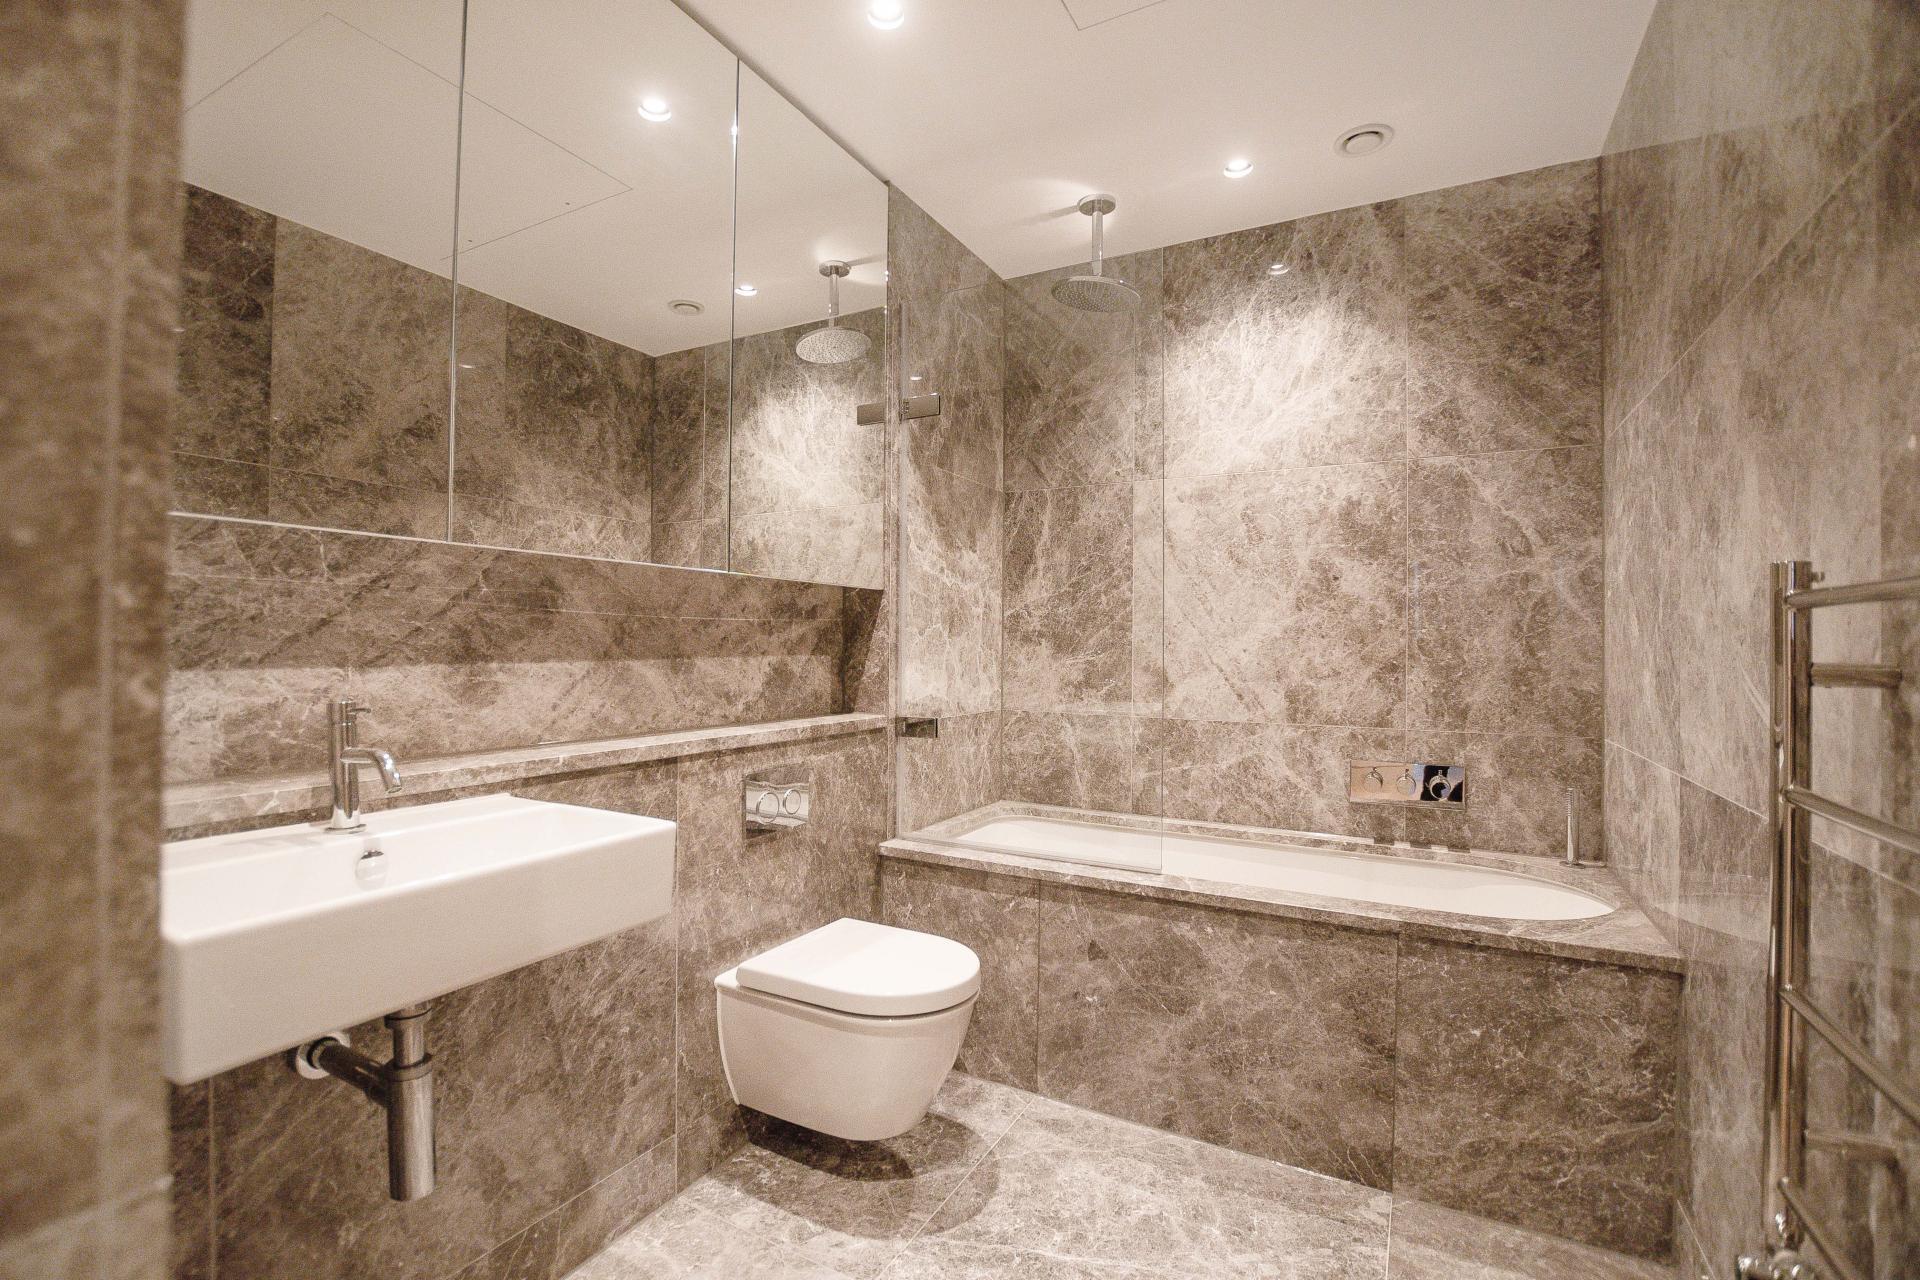 Bathroom at King's Mews Apartments, Holborn, London - Citybase Apartments